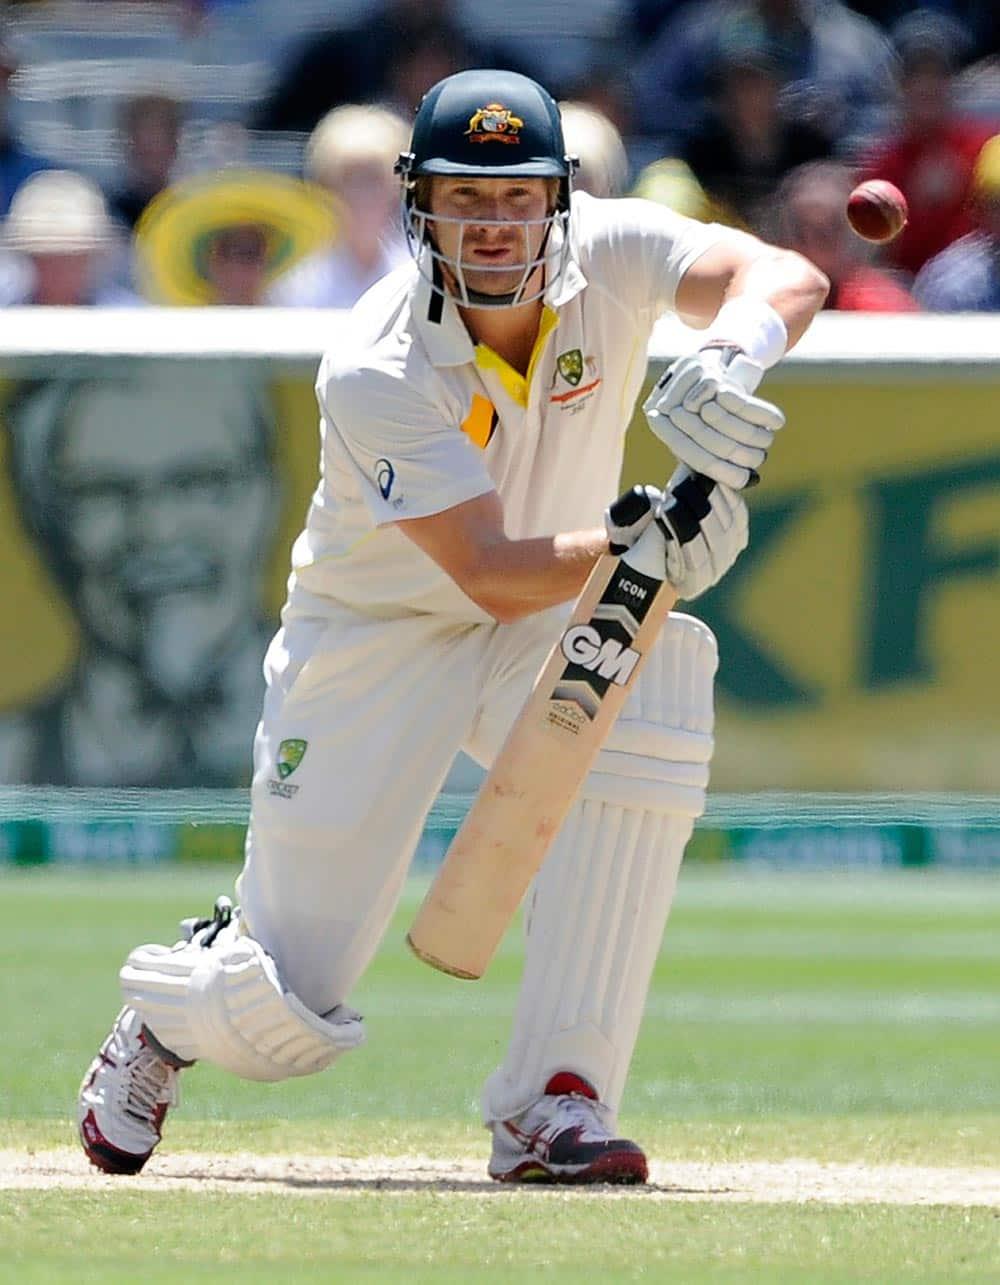 Australia's Shane Watson drives against England during their Ashes cricket test match.